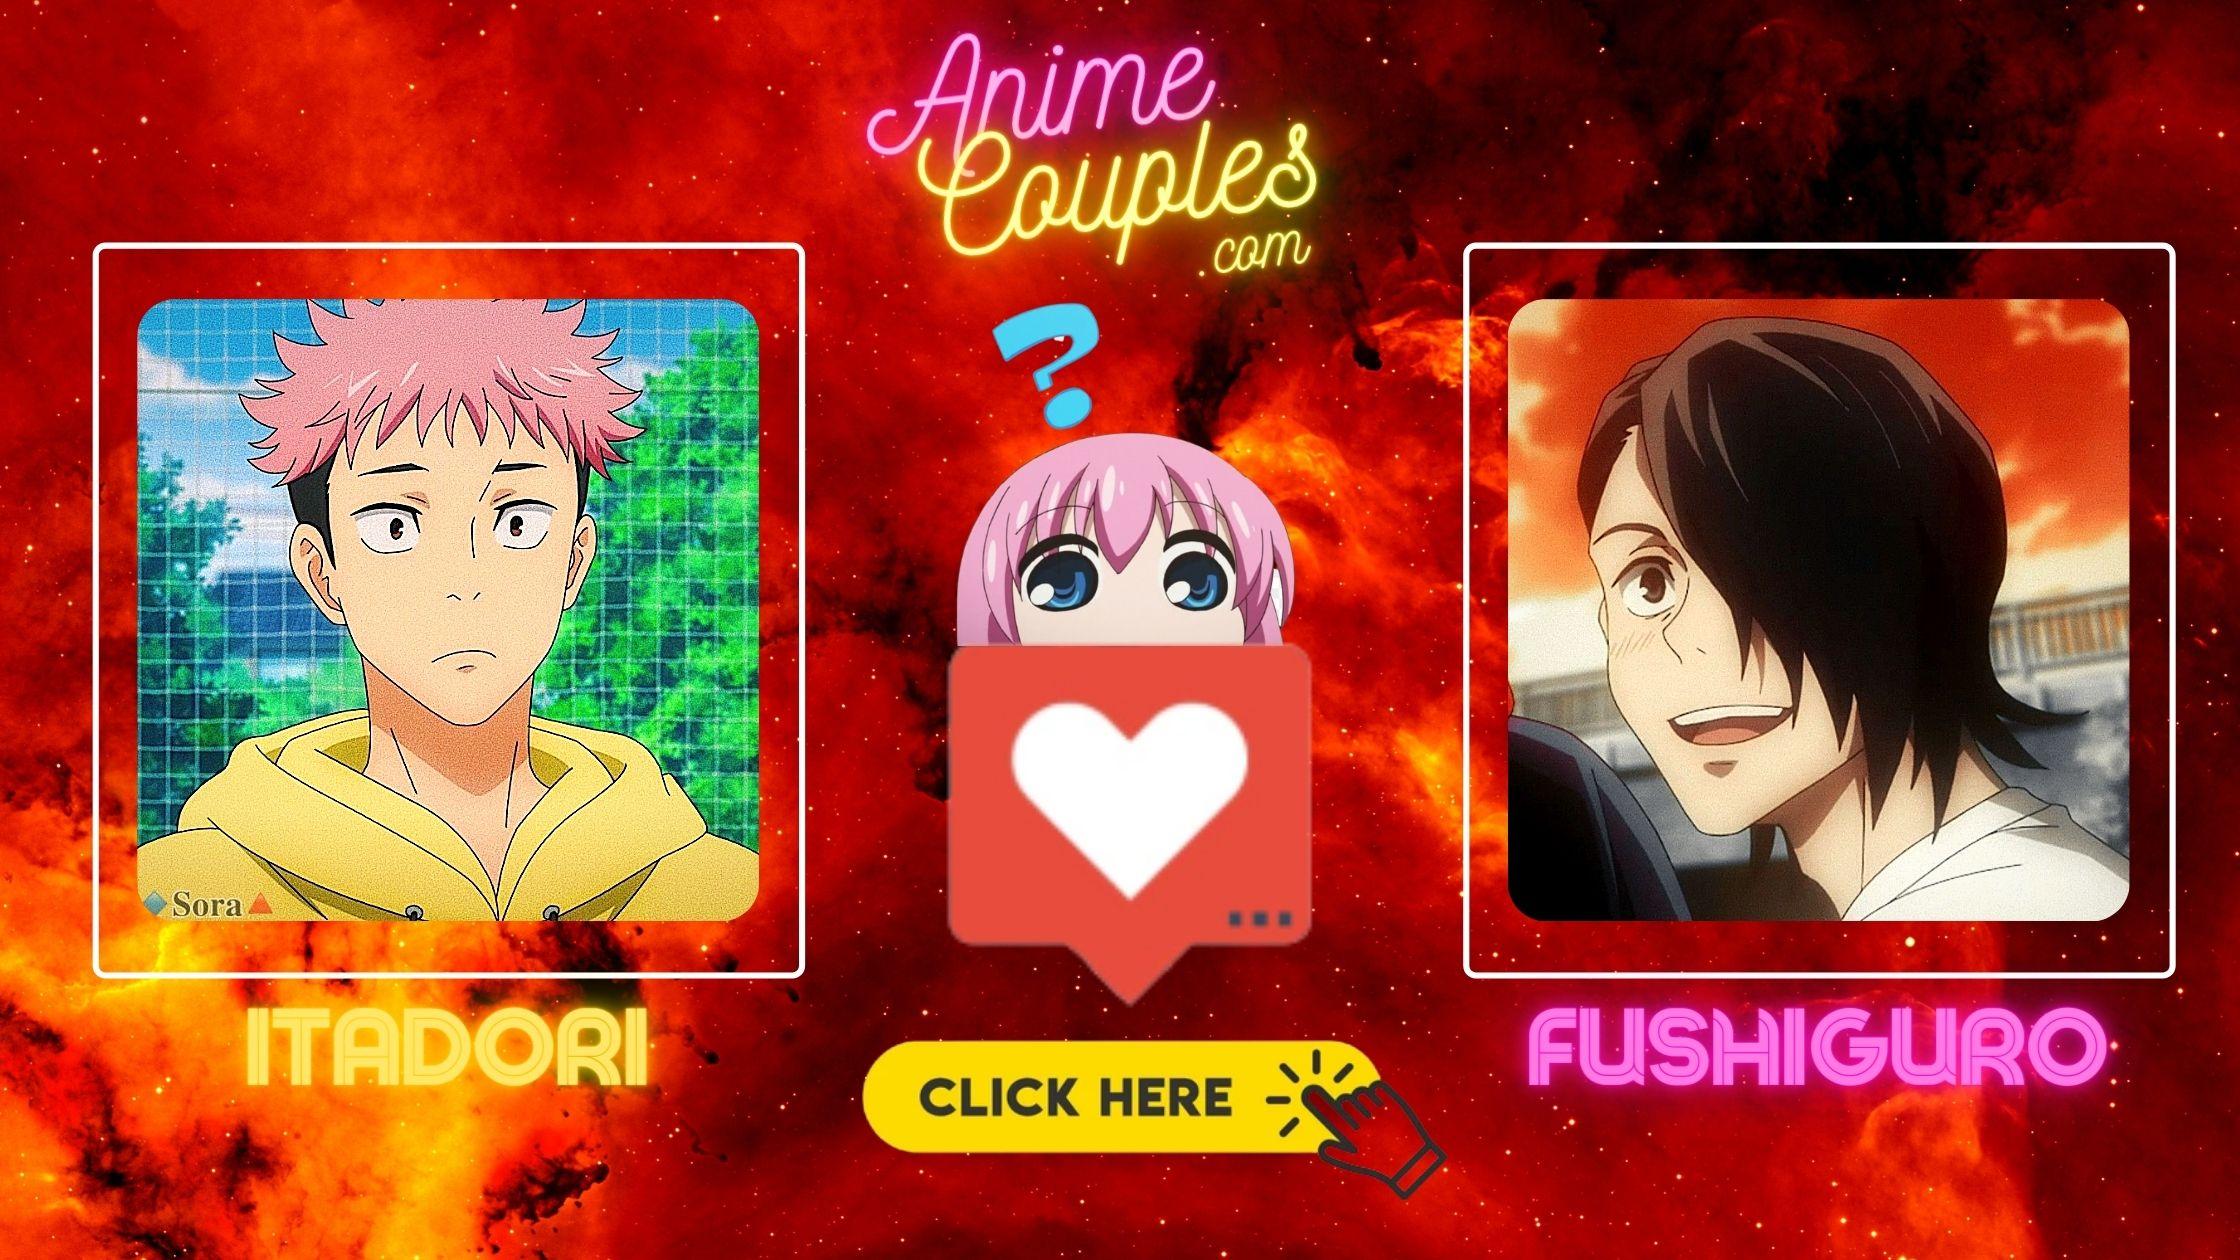 Itadori and Junpei - Jujutsu Kaisen couples